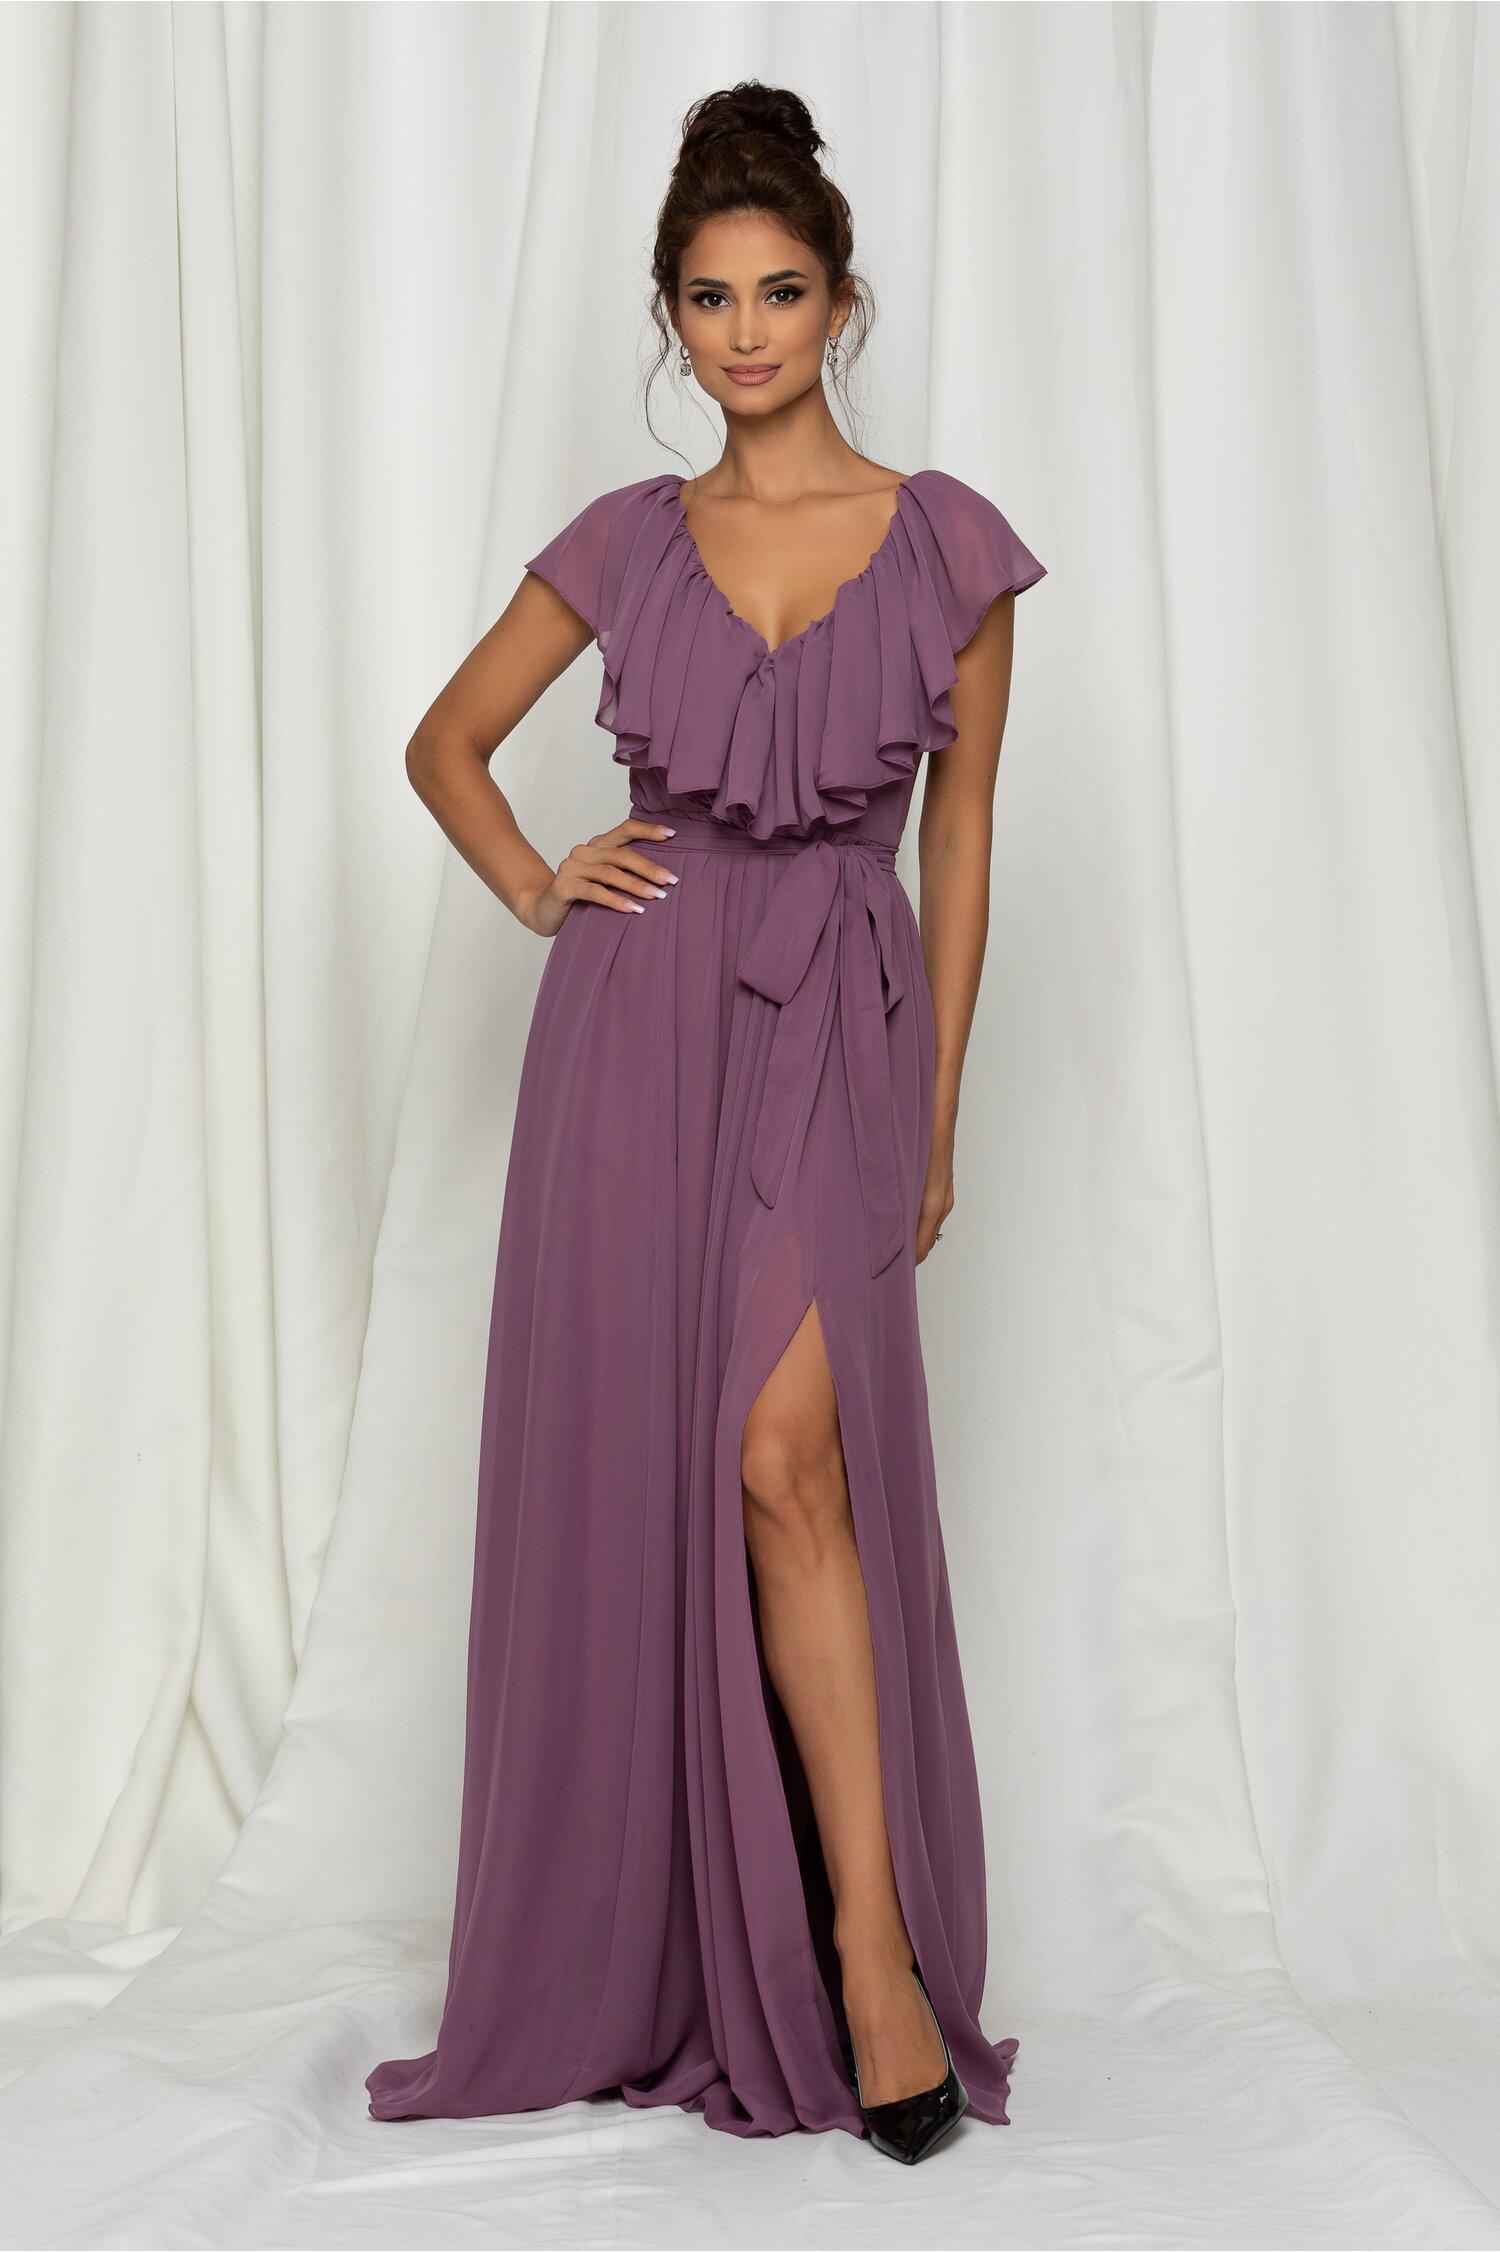 Rochie Dy Fashion Gaby lunga lila din voal cu volanase la decolteu